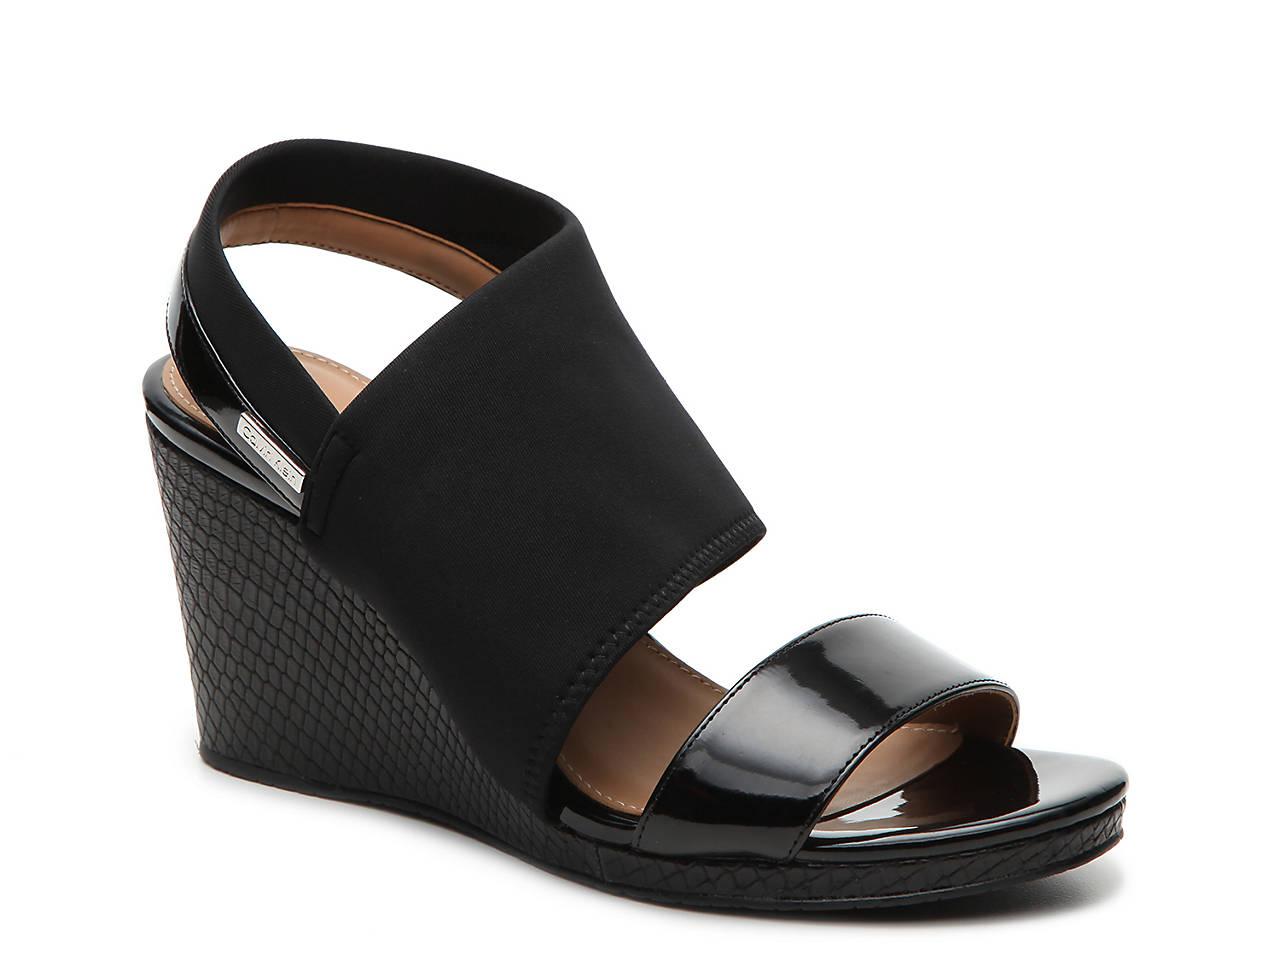 1b5bef47eae Calvin Klein Braylin Wedge Sandal Women s Shoes